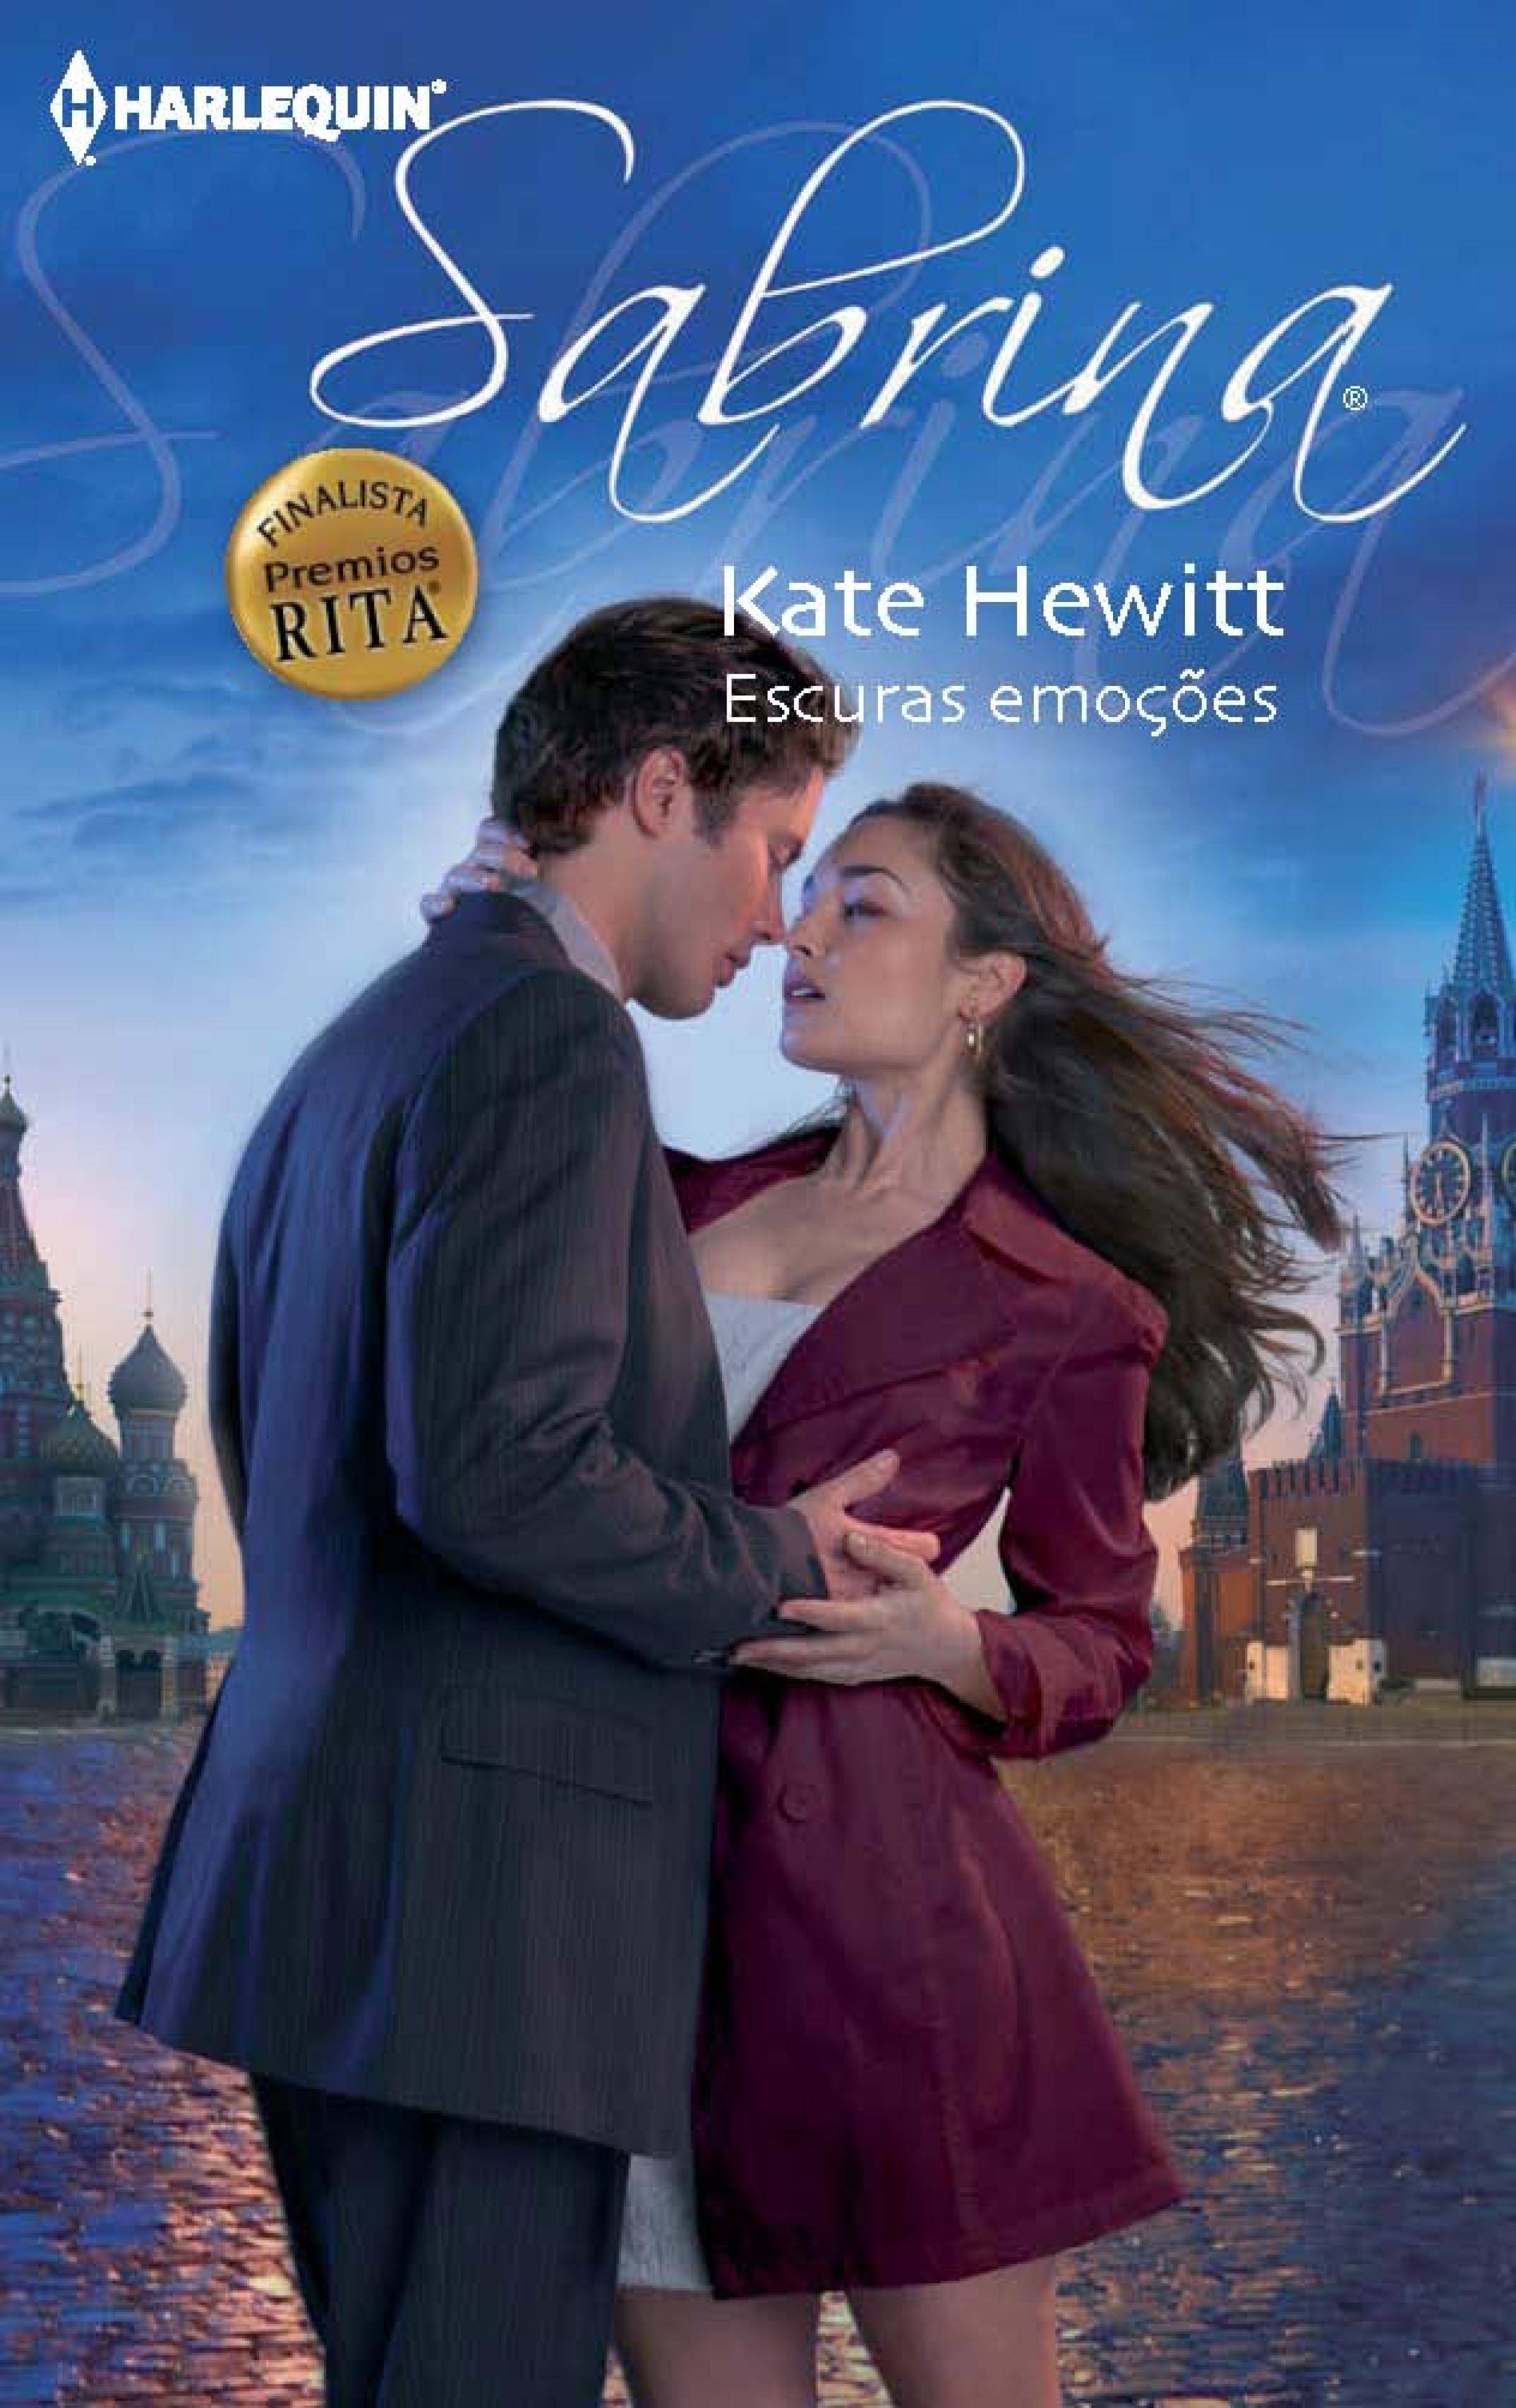 Kate Hewitt Escuras emoções kate hewitt beneath the veil of paradise